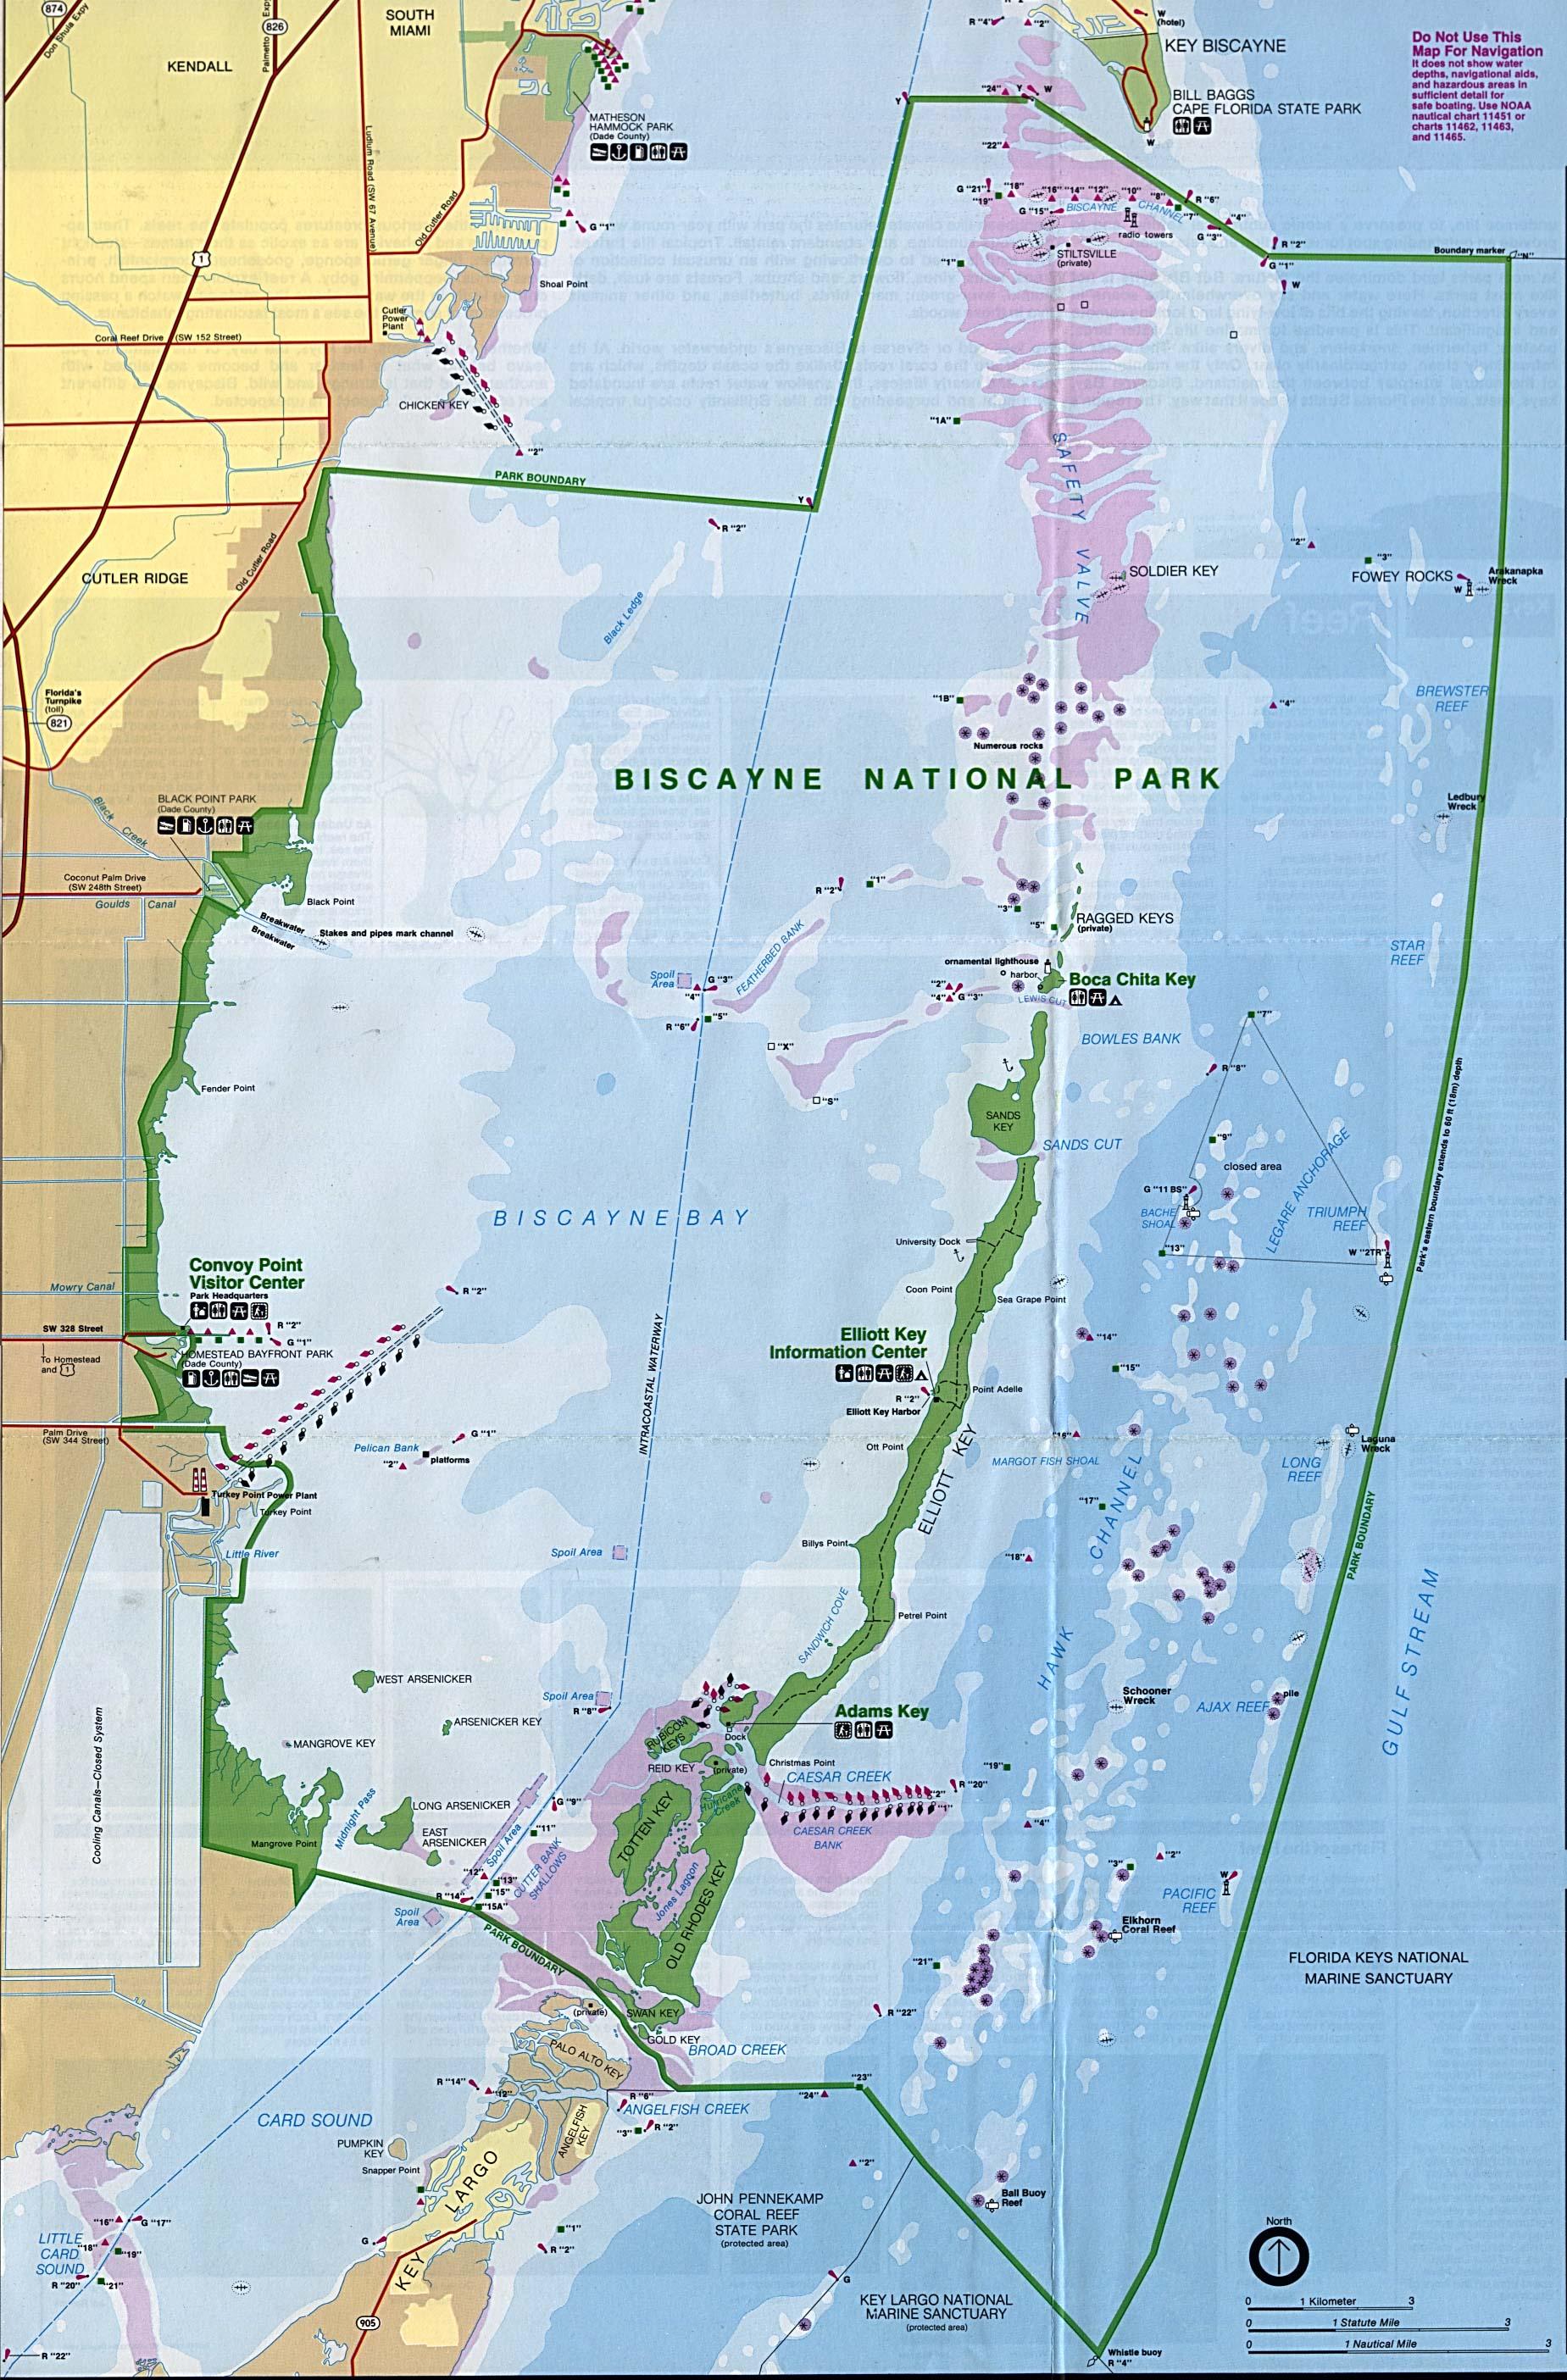 Biscayne National Park Map Map of Biscayne National Park : Worldofmaps.  online Maps and